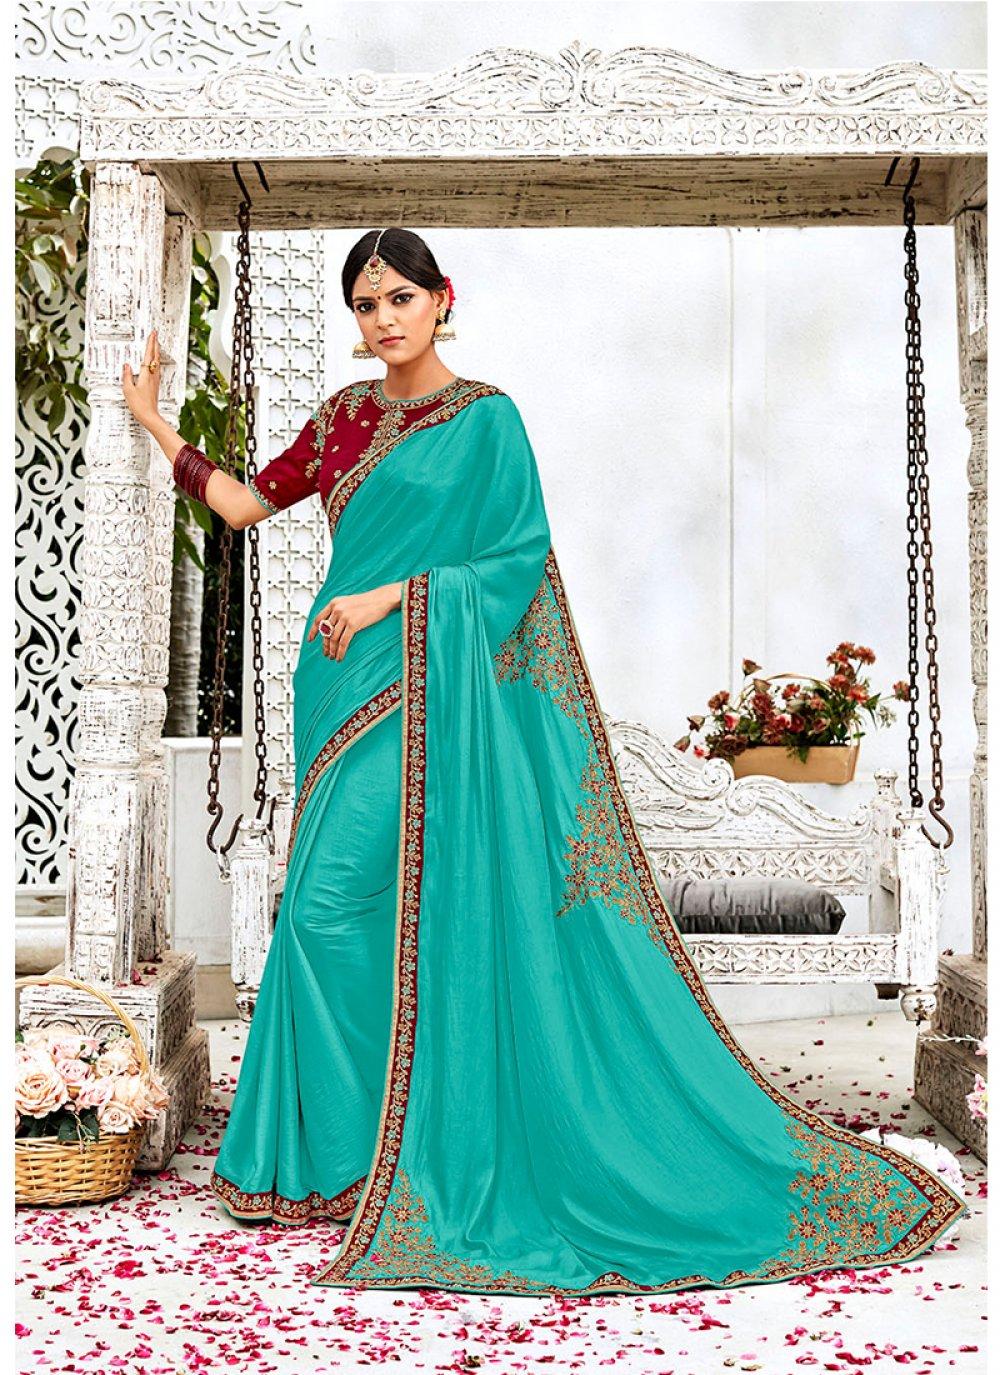 Silk Lace Work Contemporary Saree